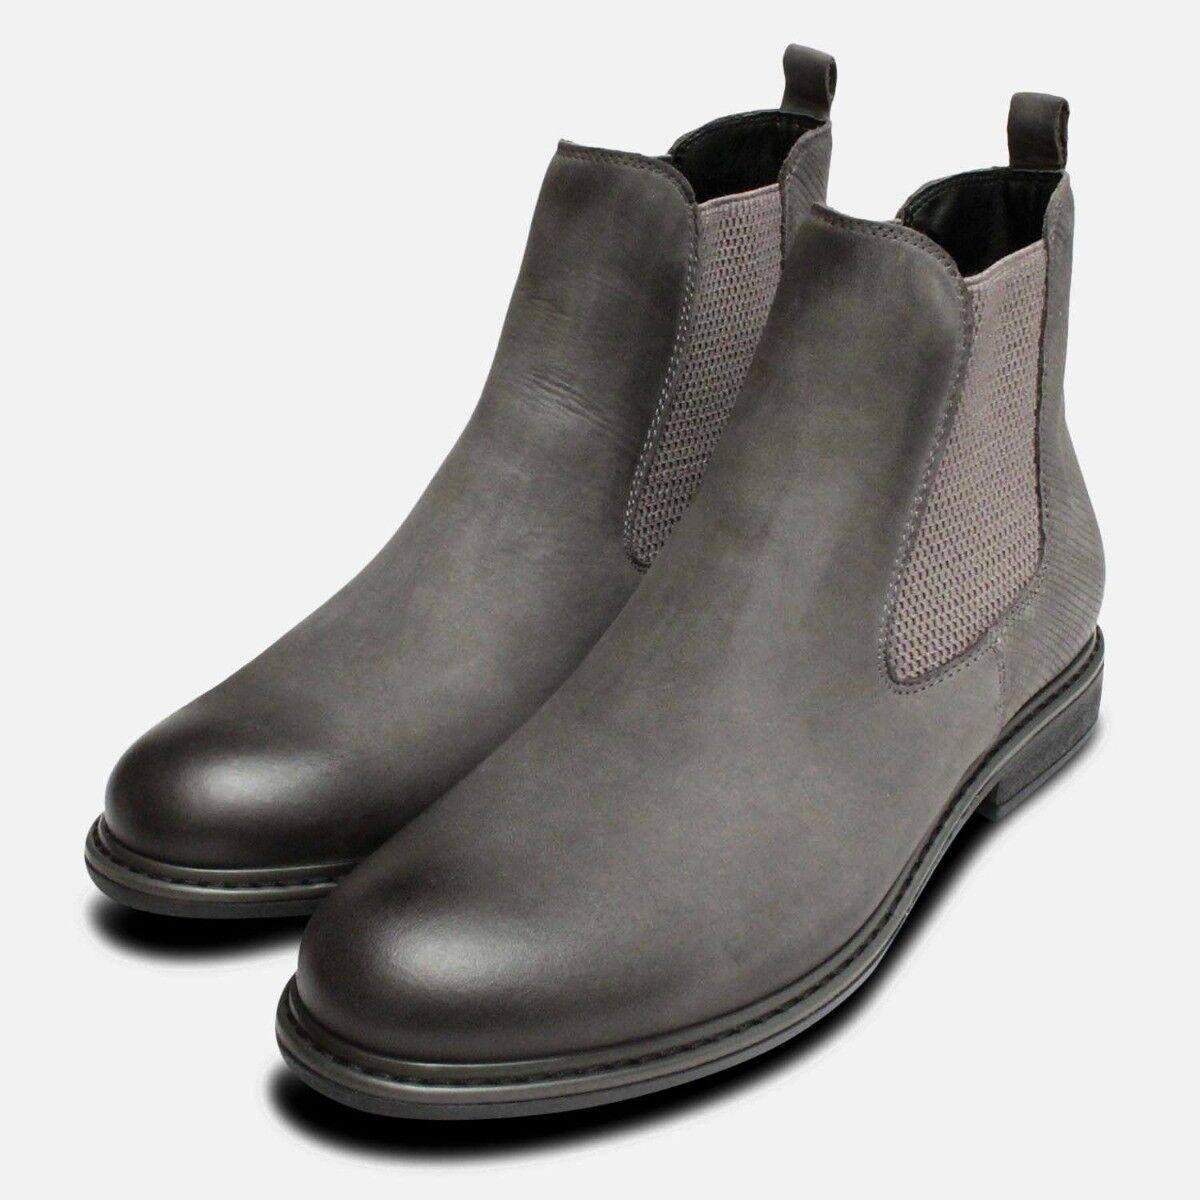 gris oscuro Damas Slip on Chelsea botas por Tamaris